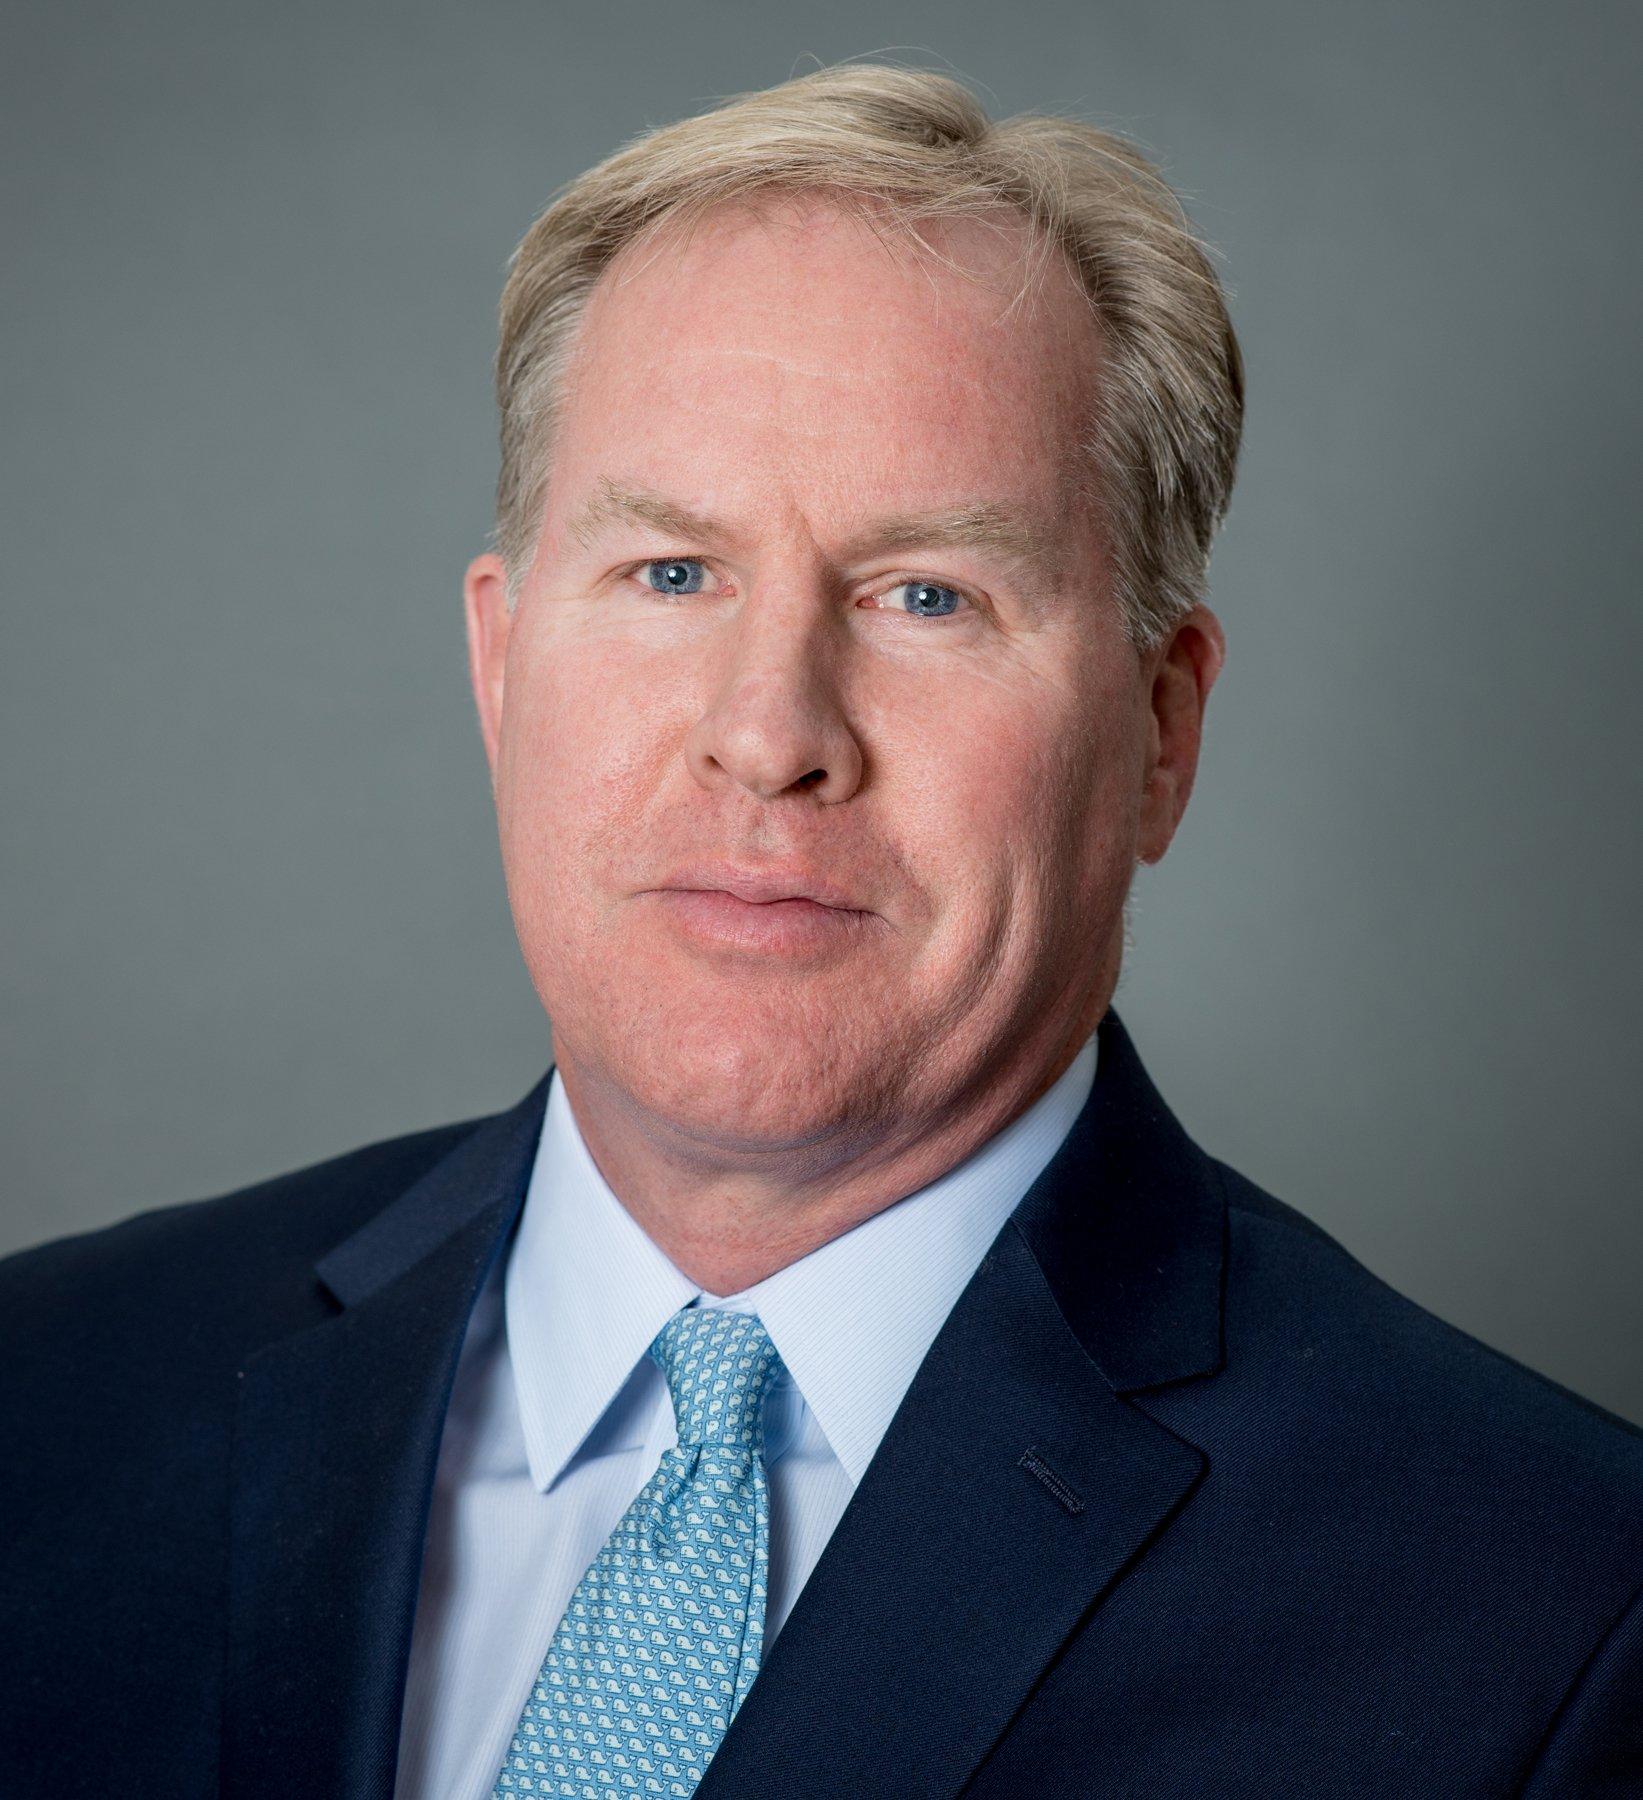 Chris O'Grady Headshot | Dakota Investments